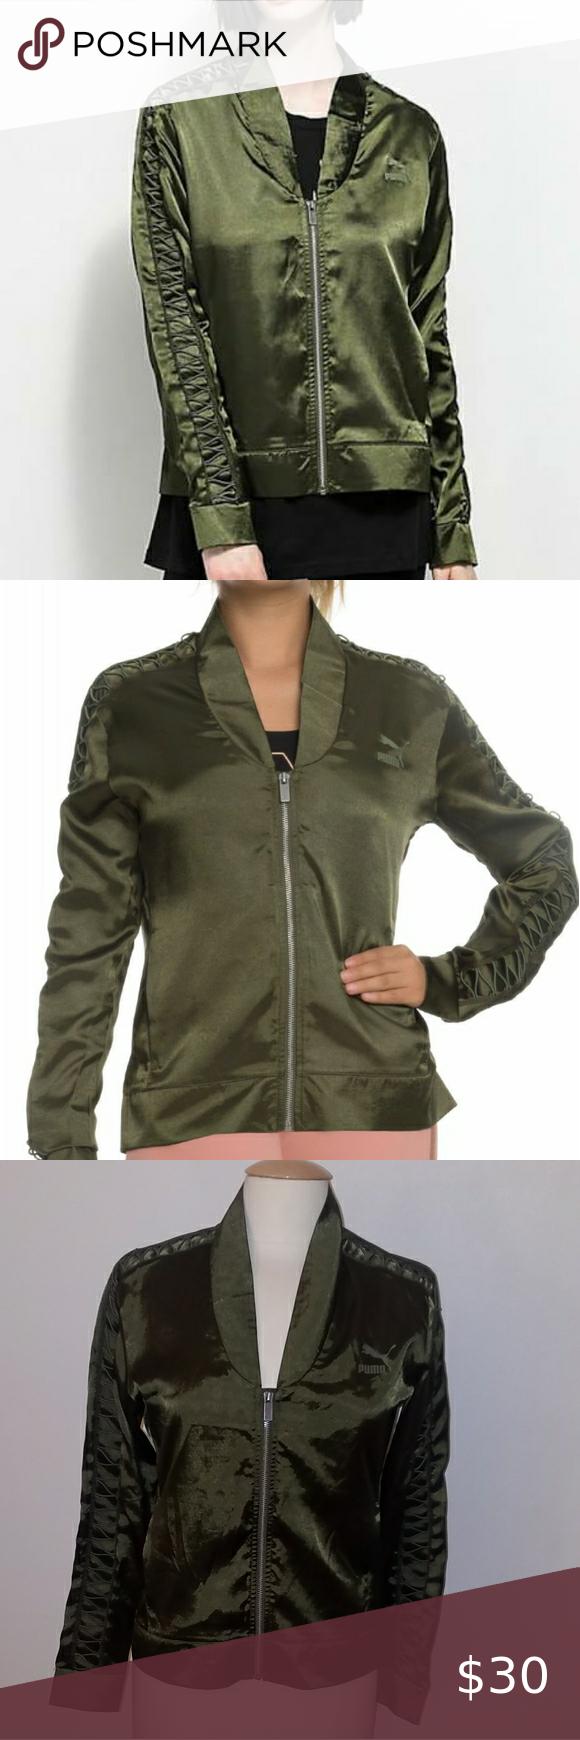 Nwot Puma Olive Green Satin Bomber Jacket Satin Bomber Jacket Olive Green Jacket Coats Jackets Women [ 1740 x 580 Pixel ]